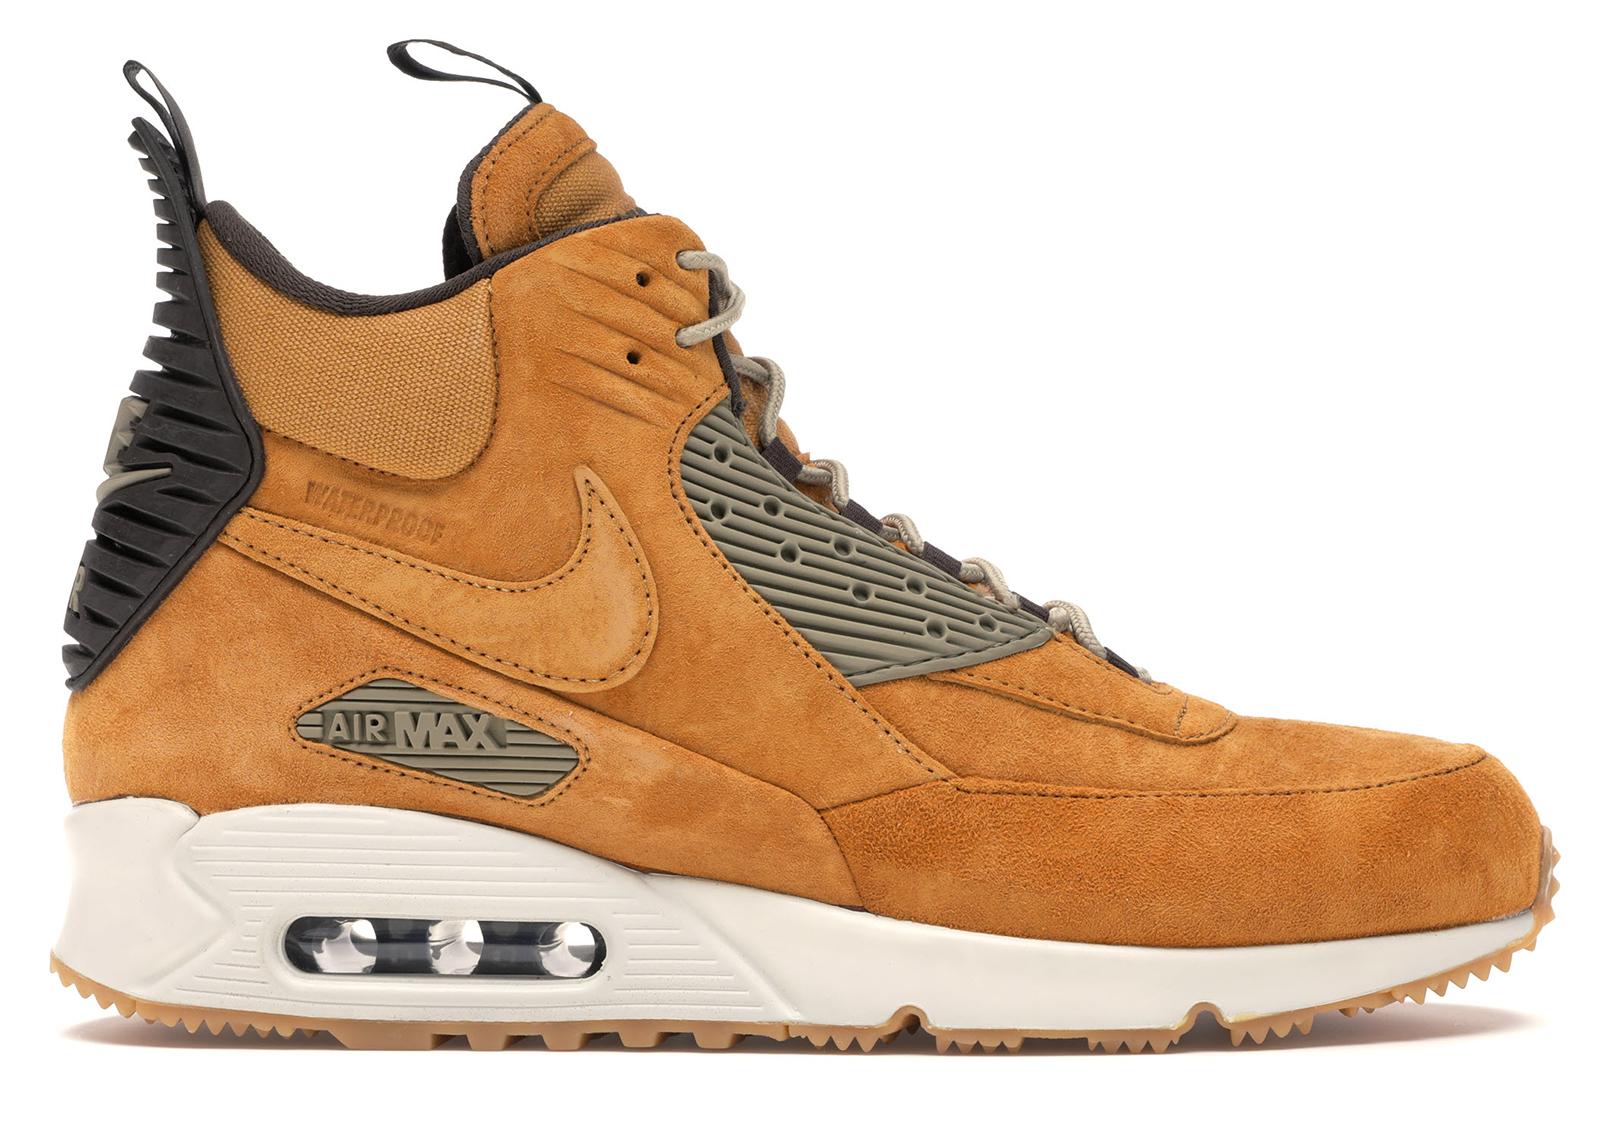 Nike Air Max 90 Sneakerboot Winter Wheat